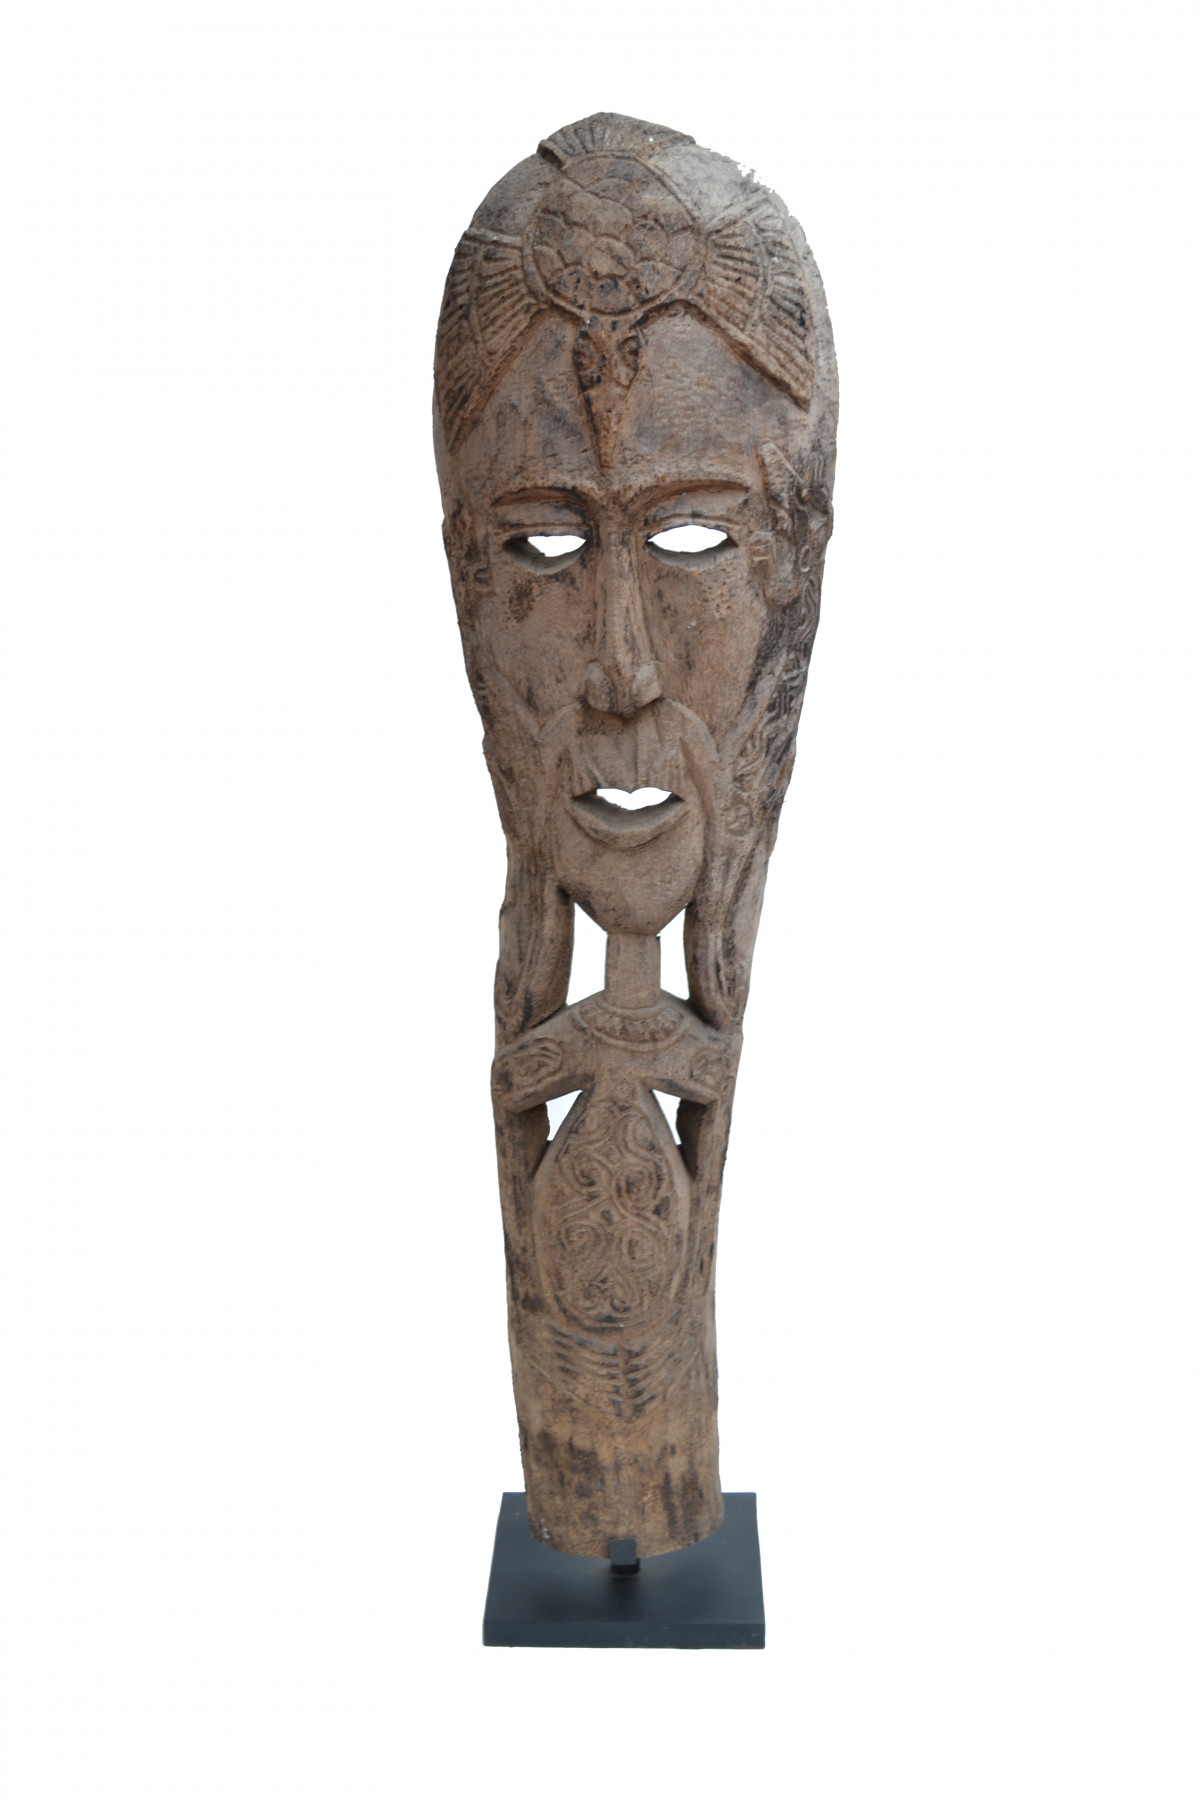 Grand masque bois Timor 1